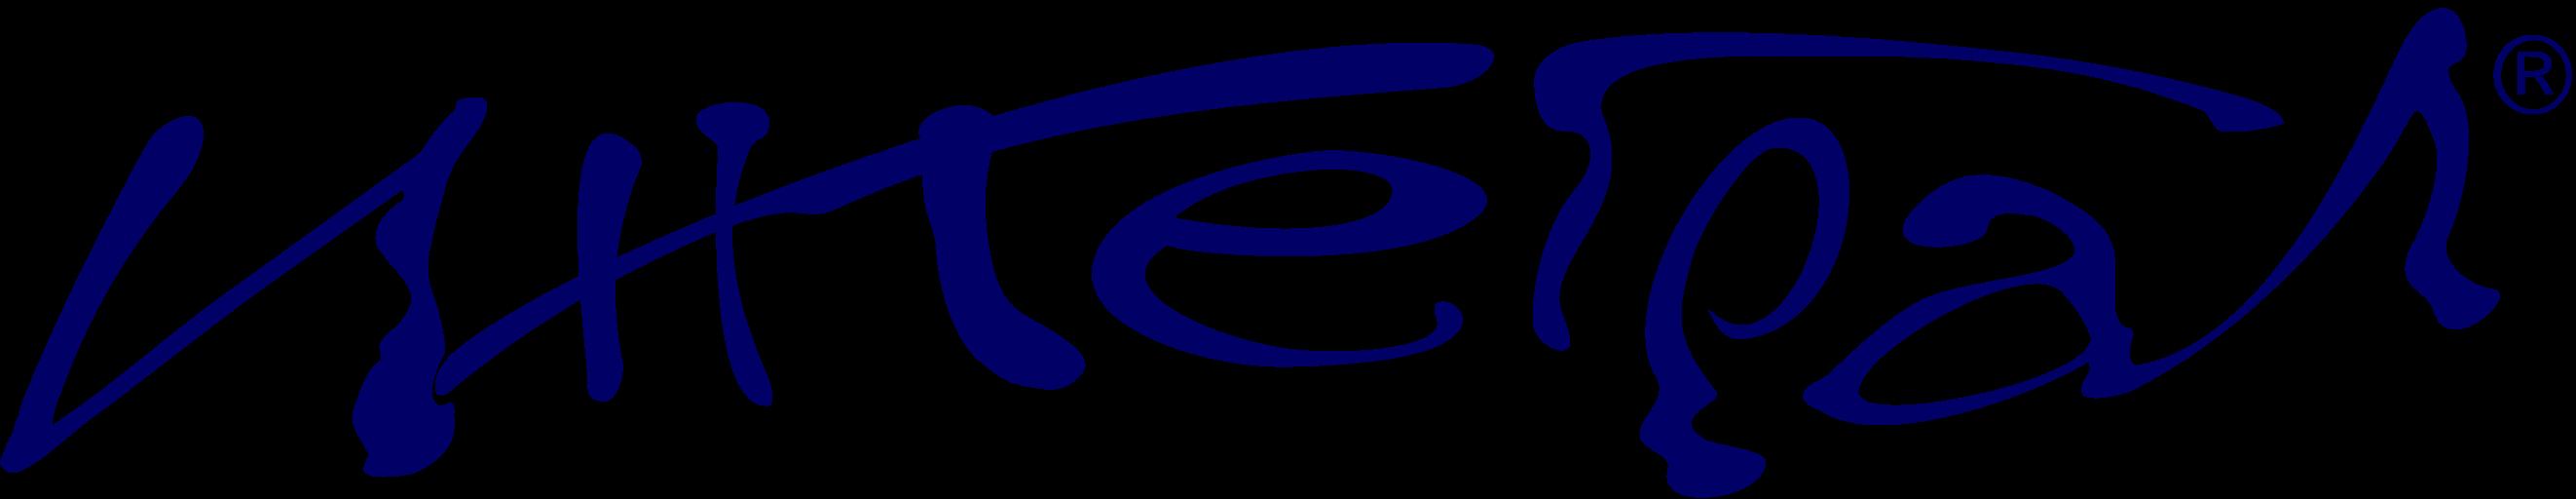 Интеграл Logo